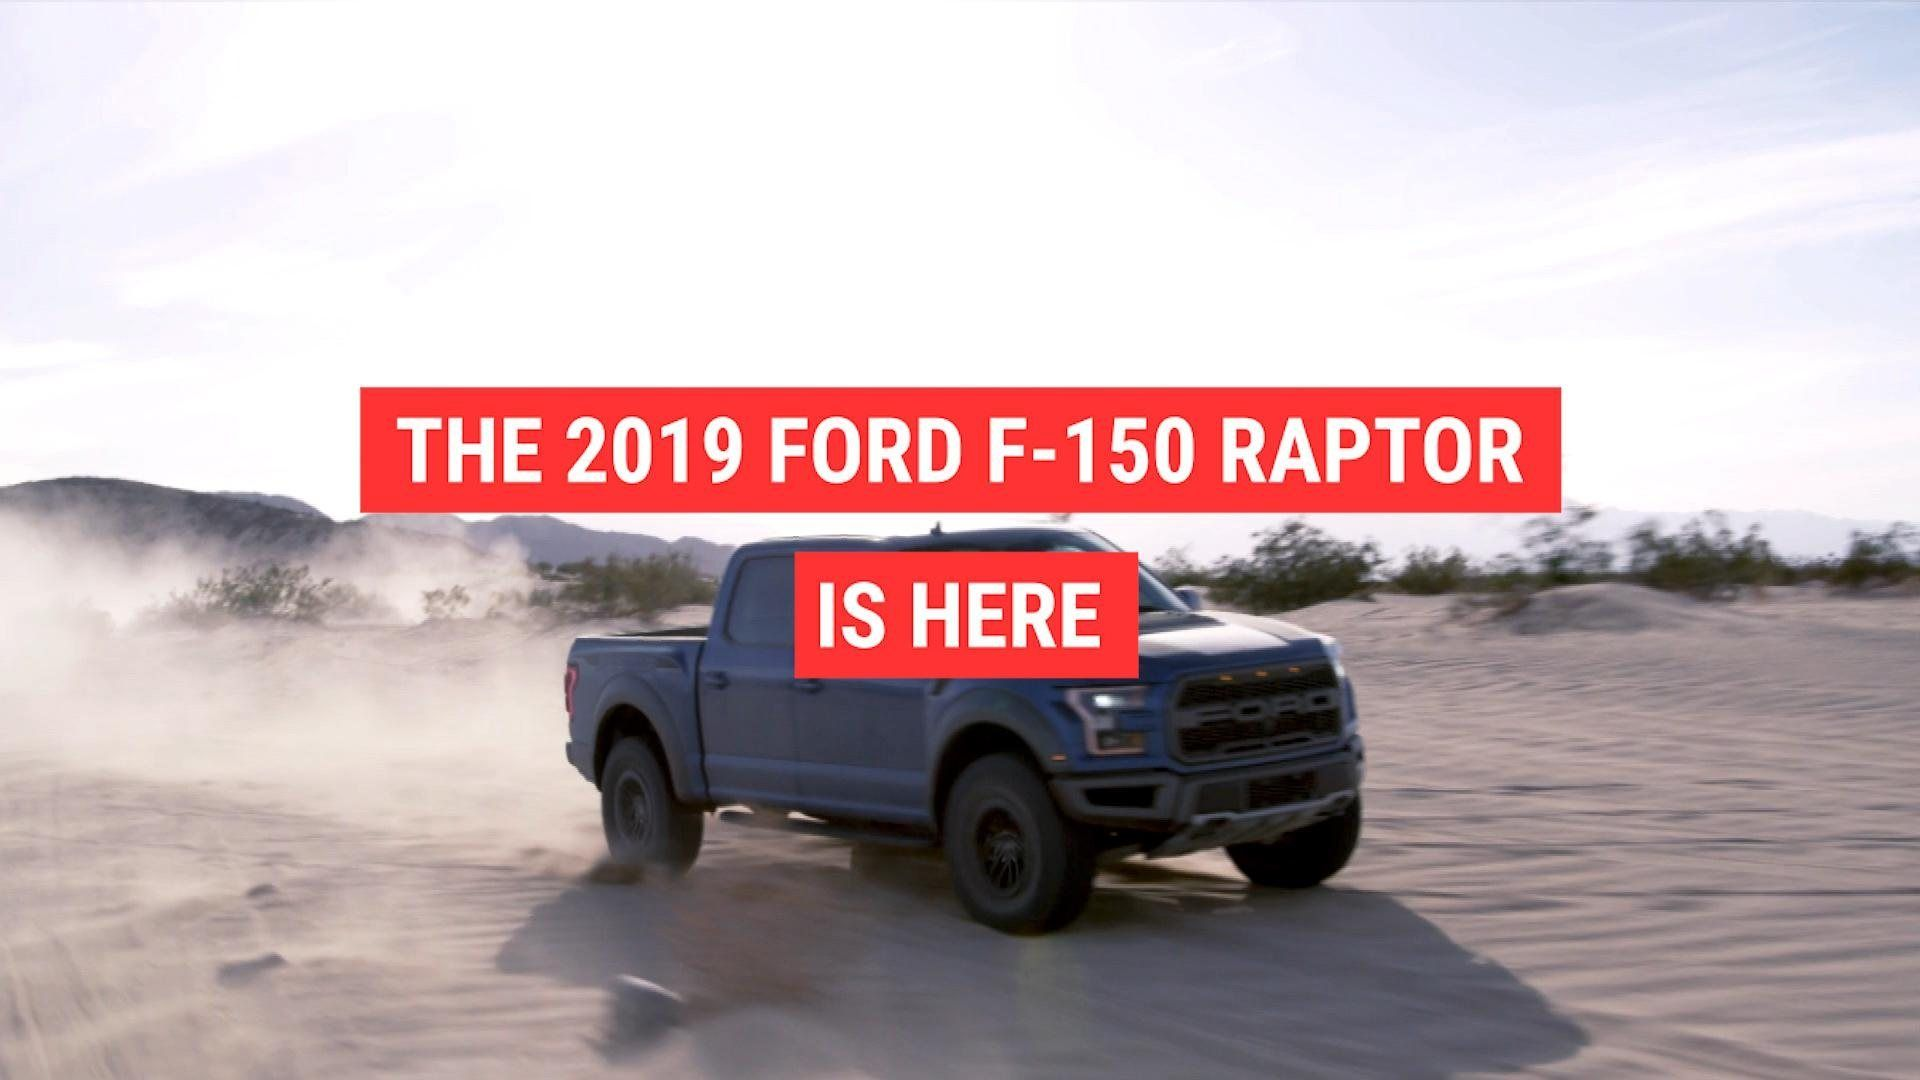 2020 ford Svt Bronco Raptor Wallpaper in 2020 | 2019 ford ...